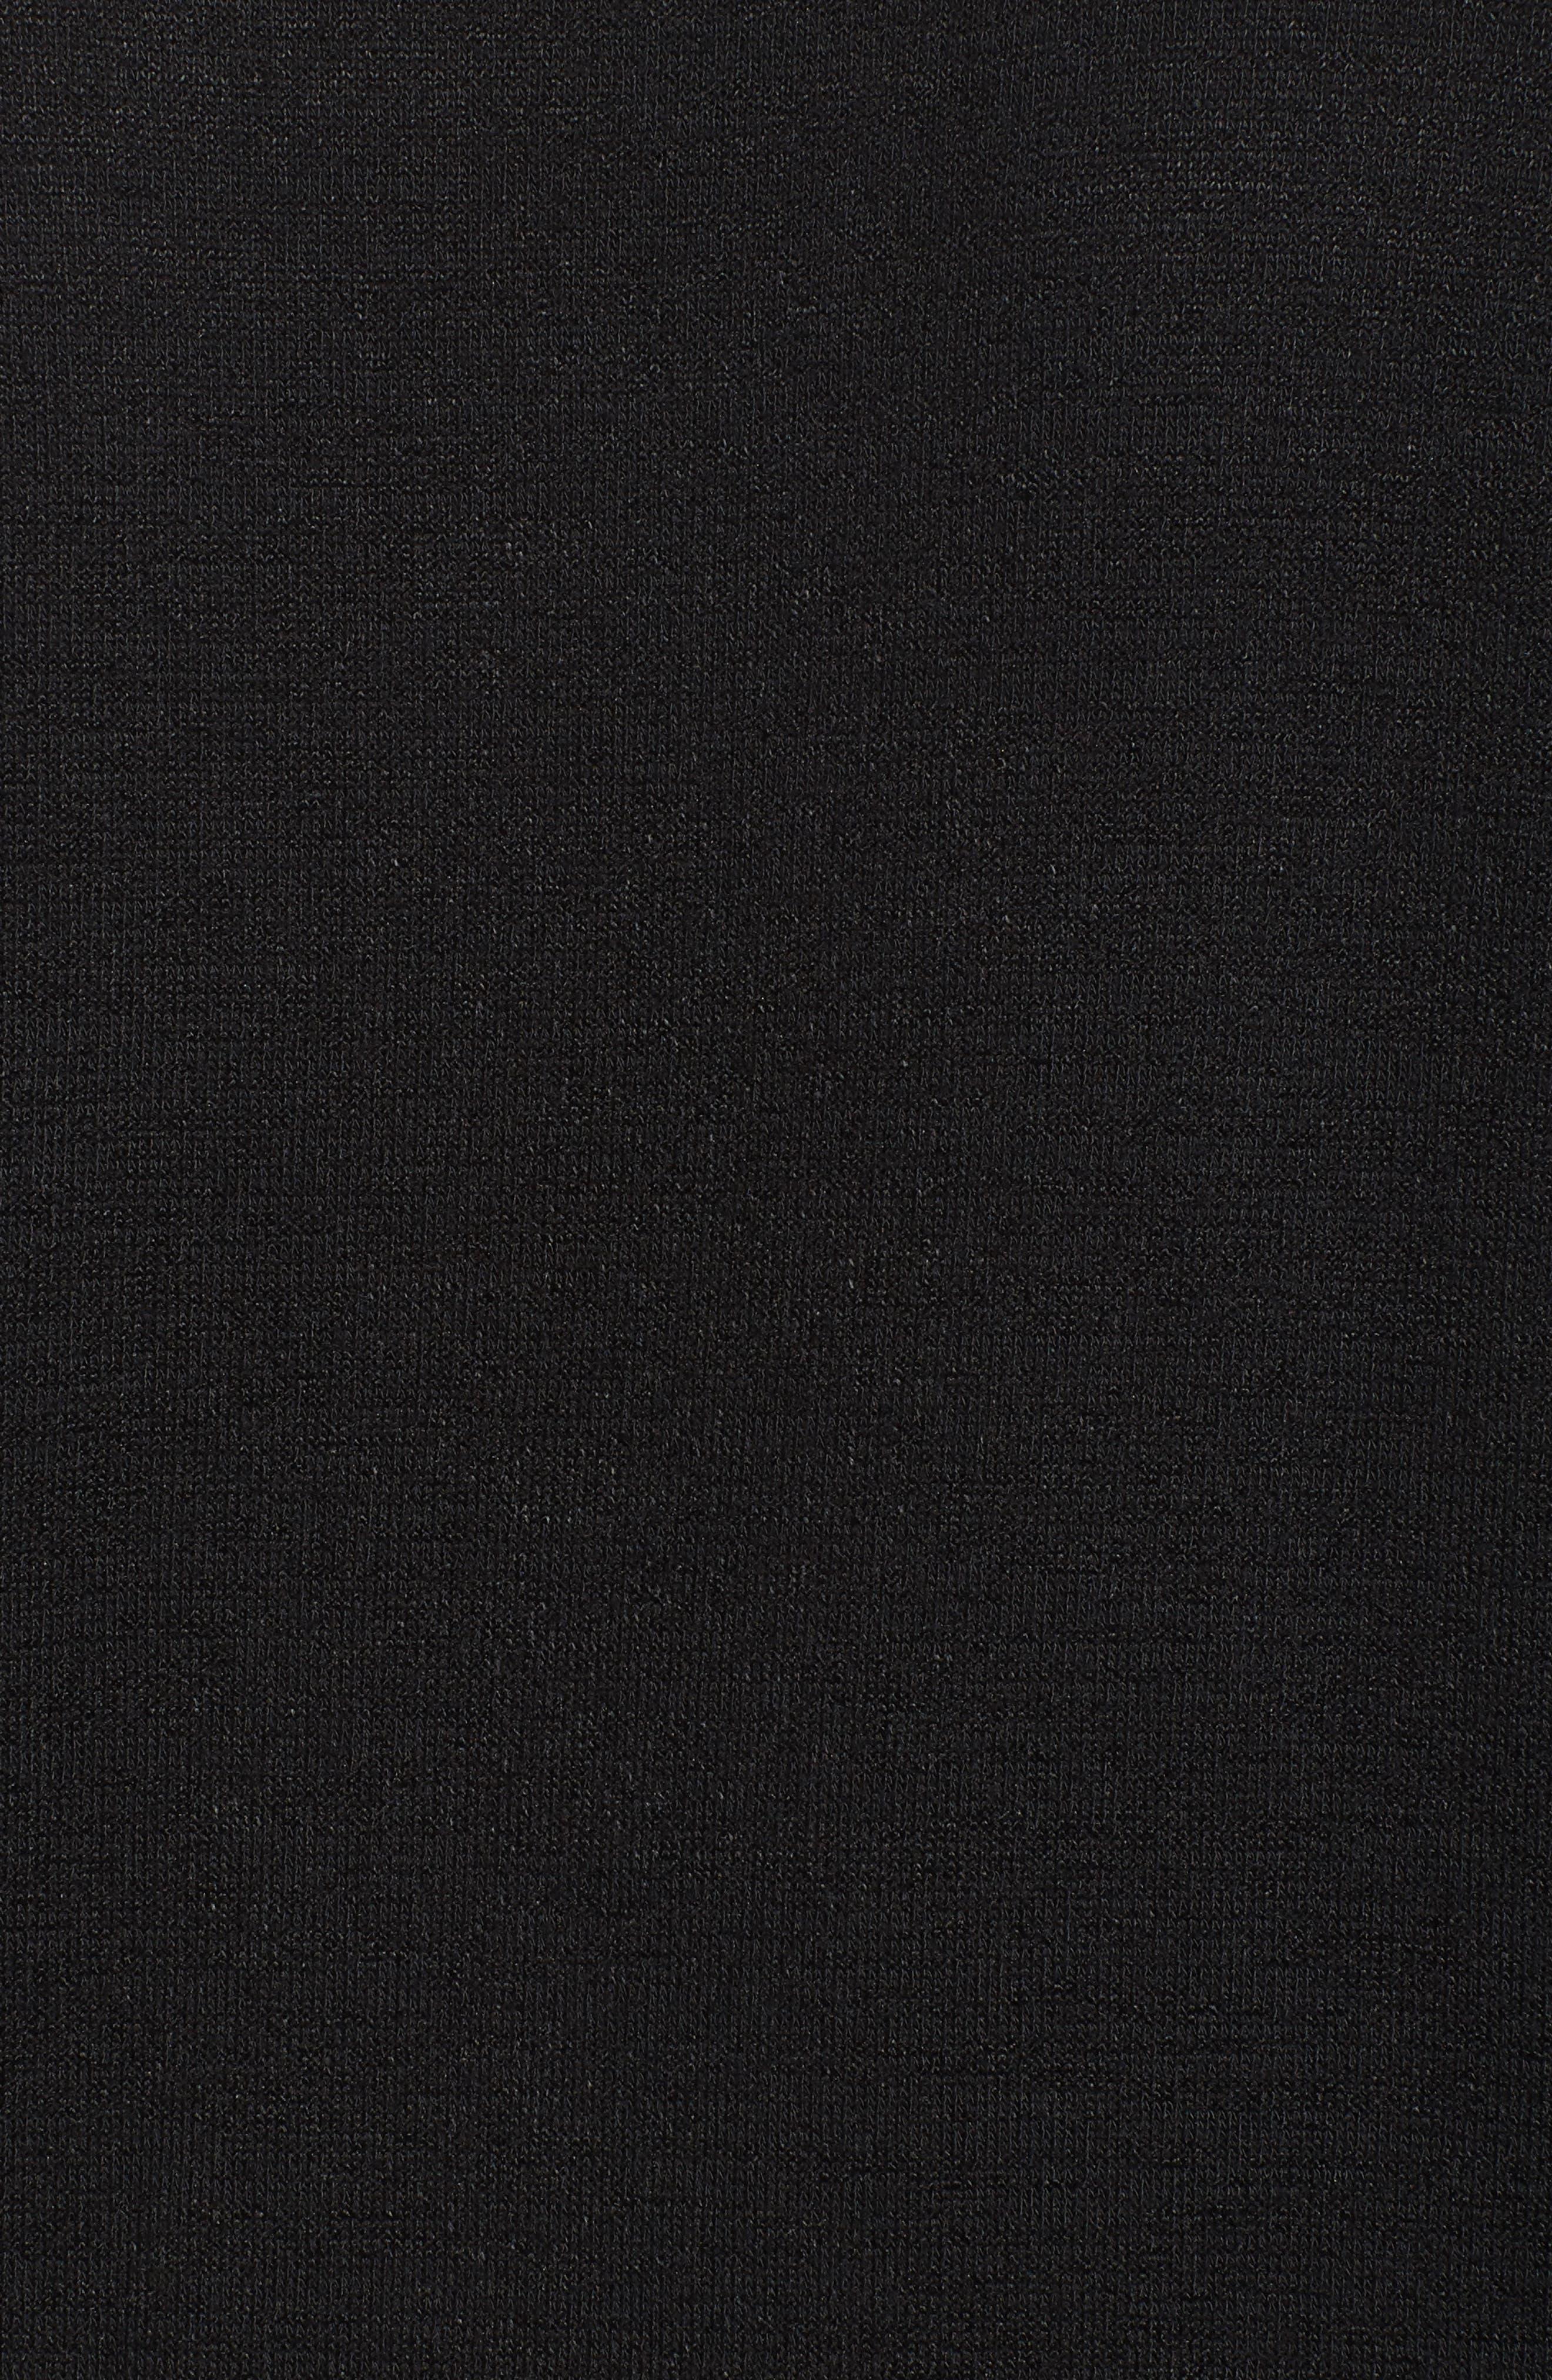 Hudson Tee,                             Alternate thumbnail 5, color,                             Black